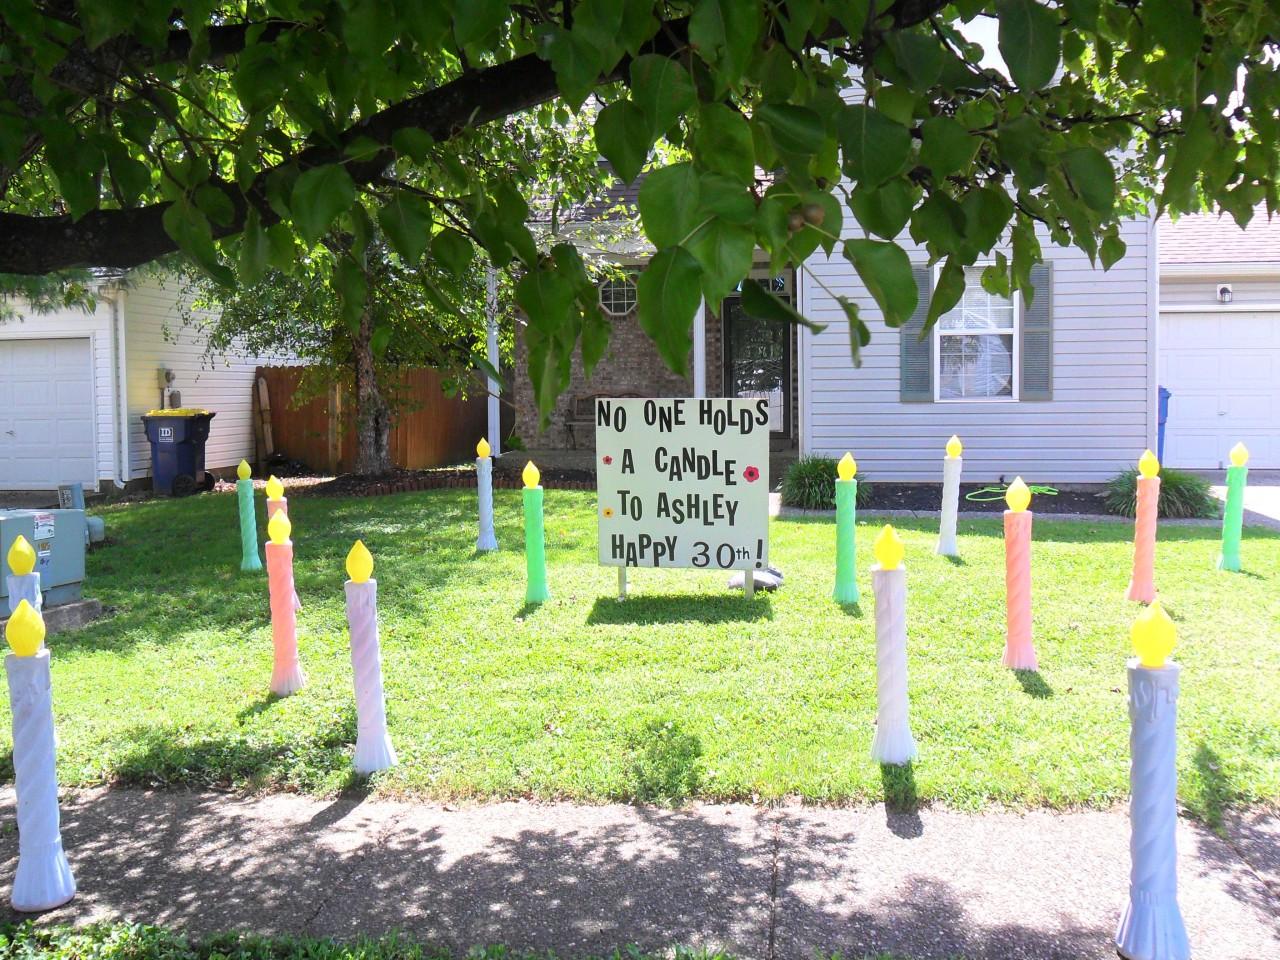 Candle Birthday Lawn Display